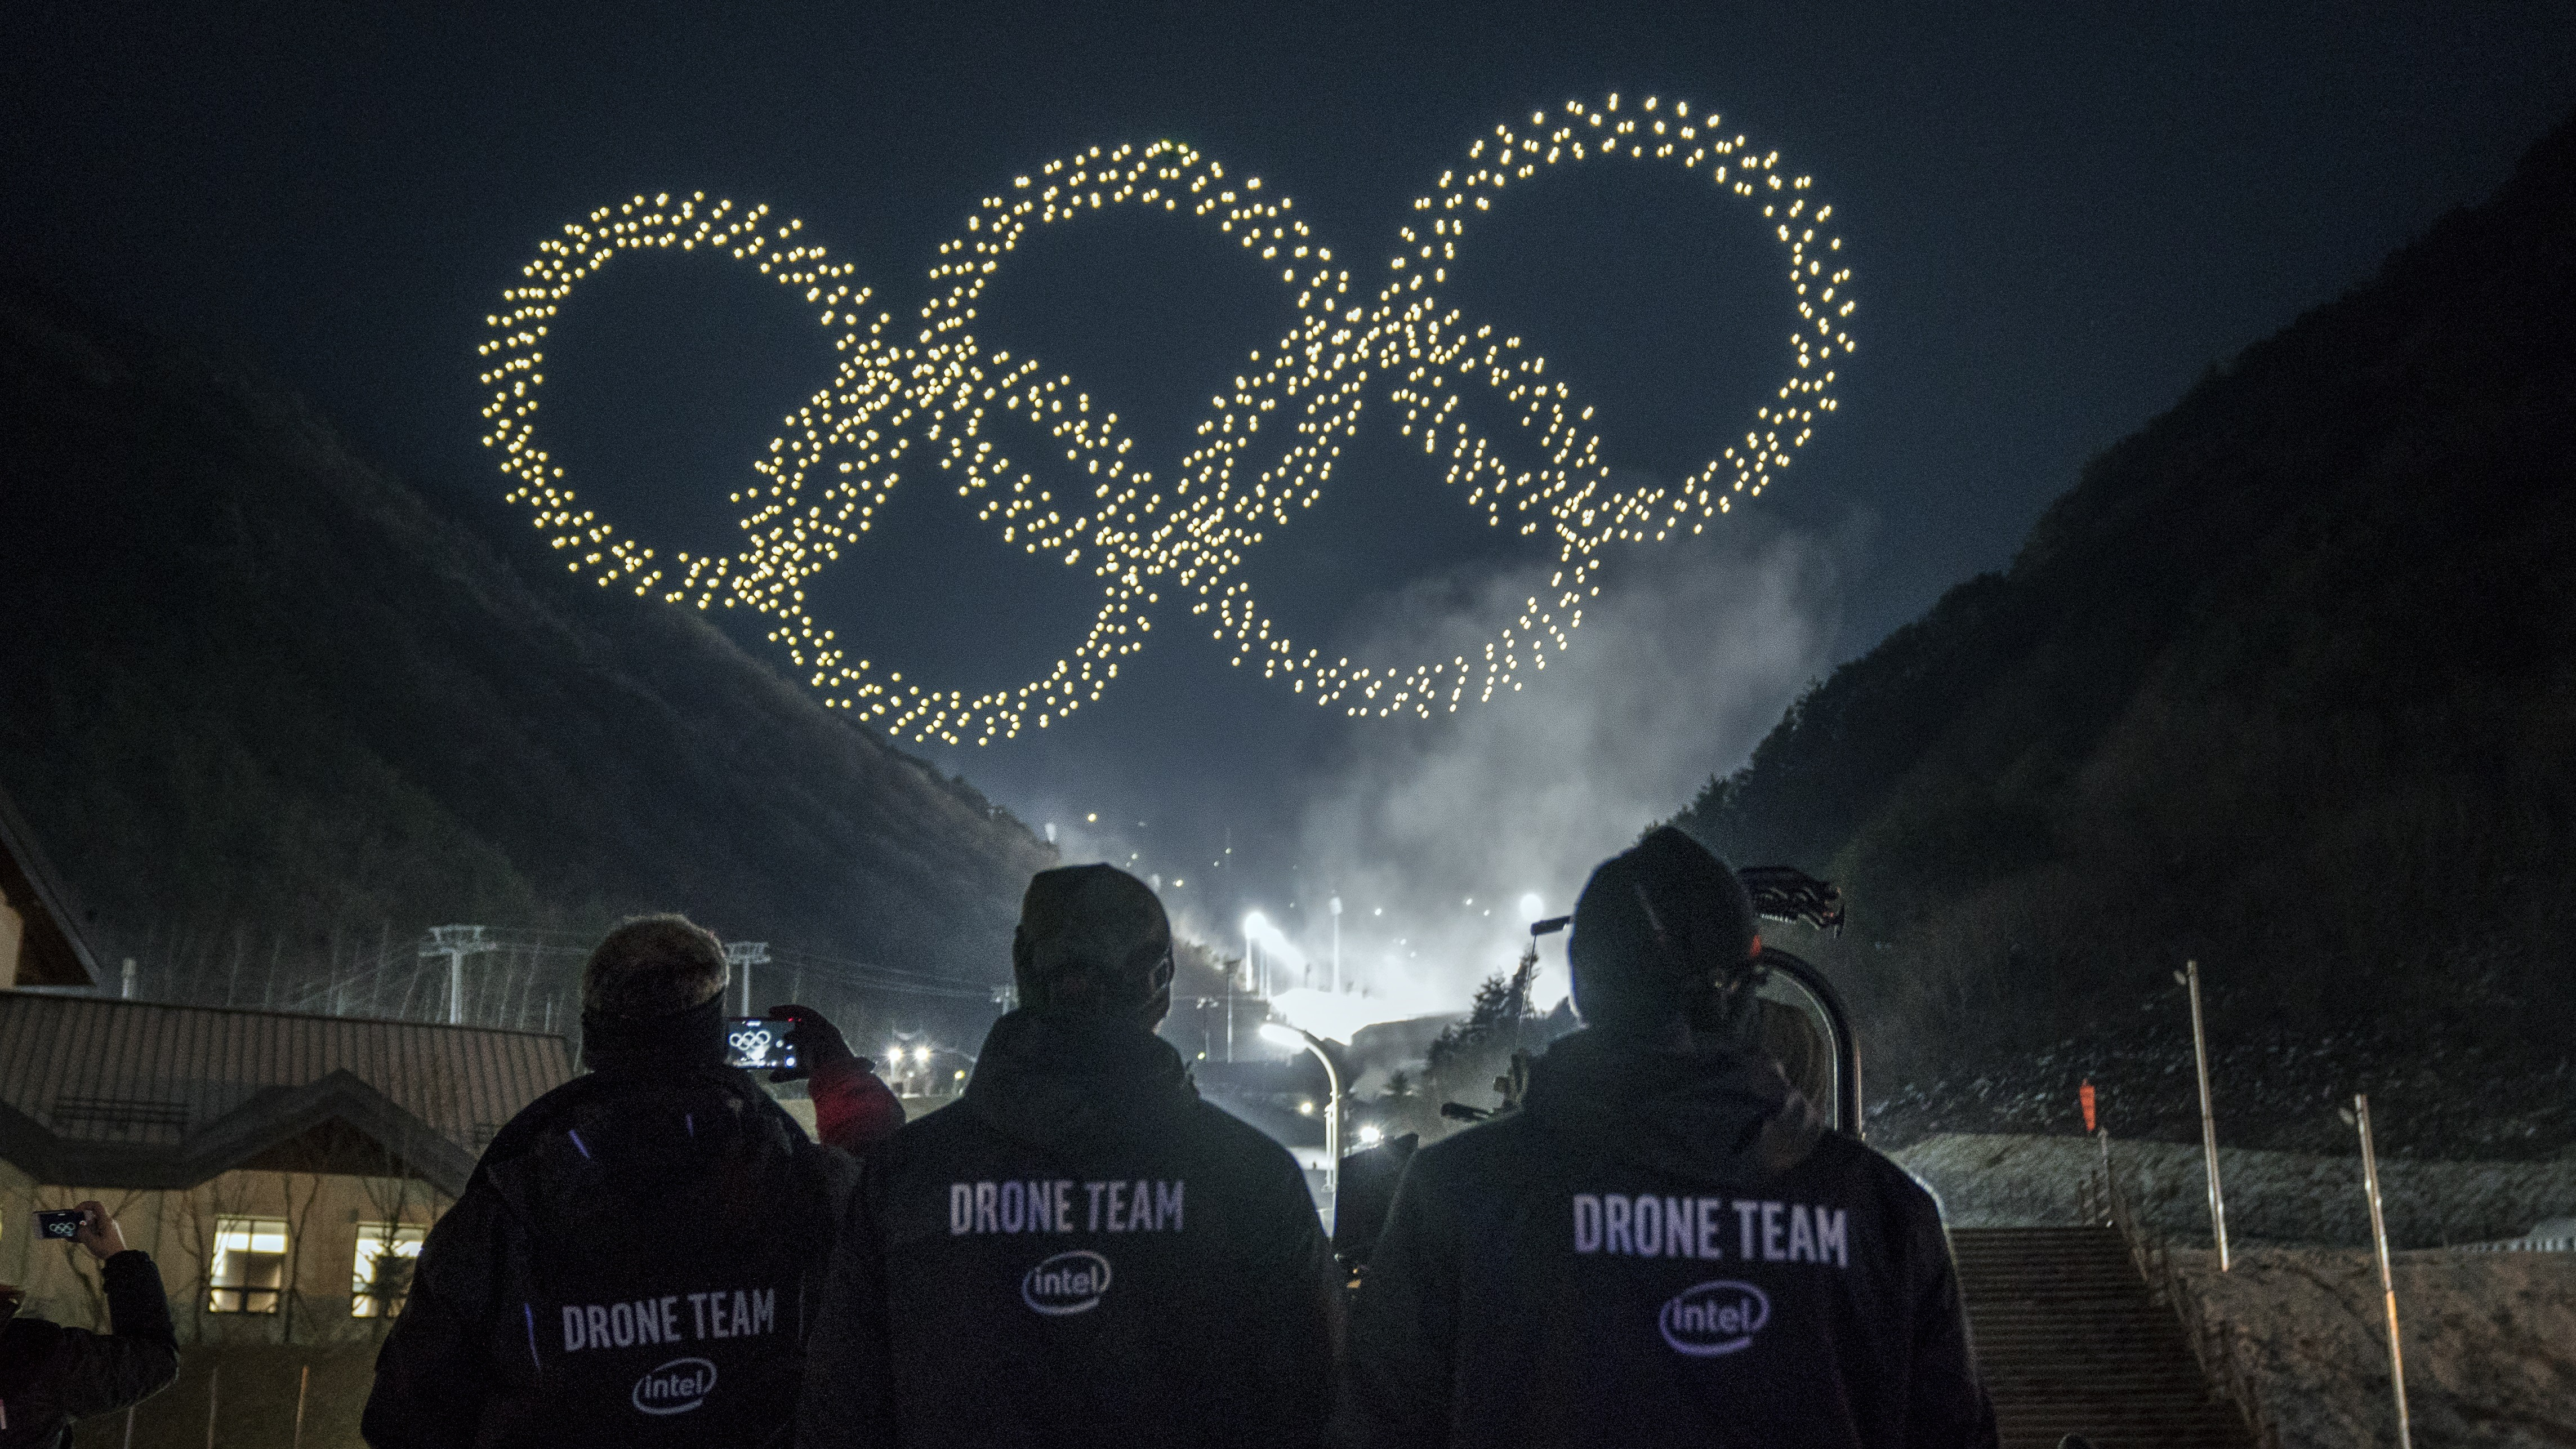 Intel-2018-Olympics-Drone-Ligh-Show-1